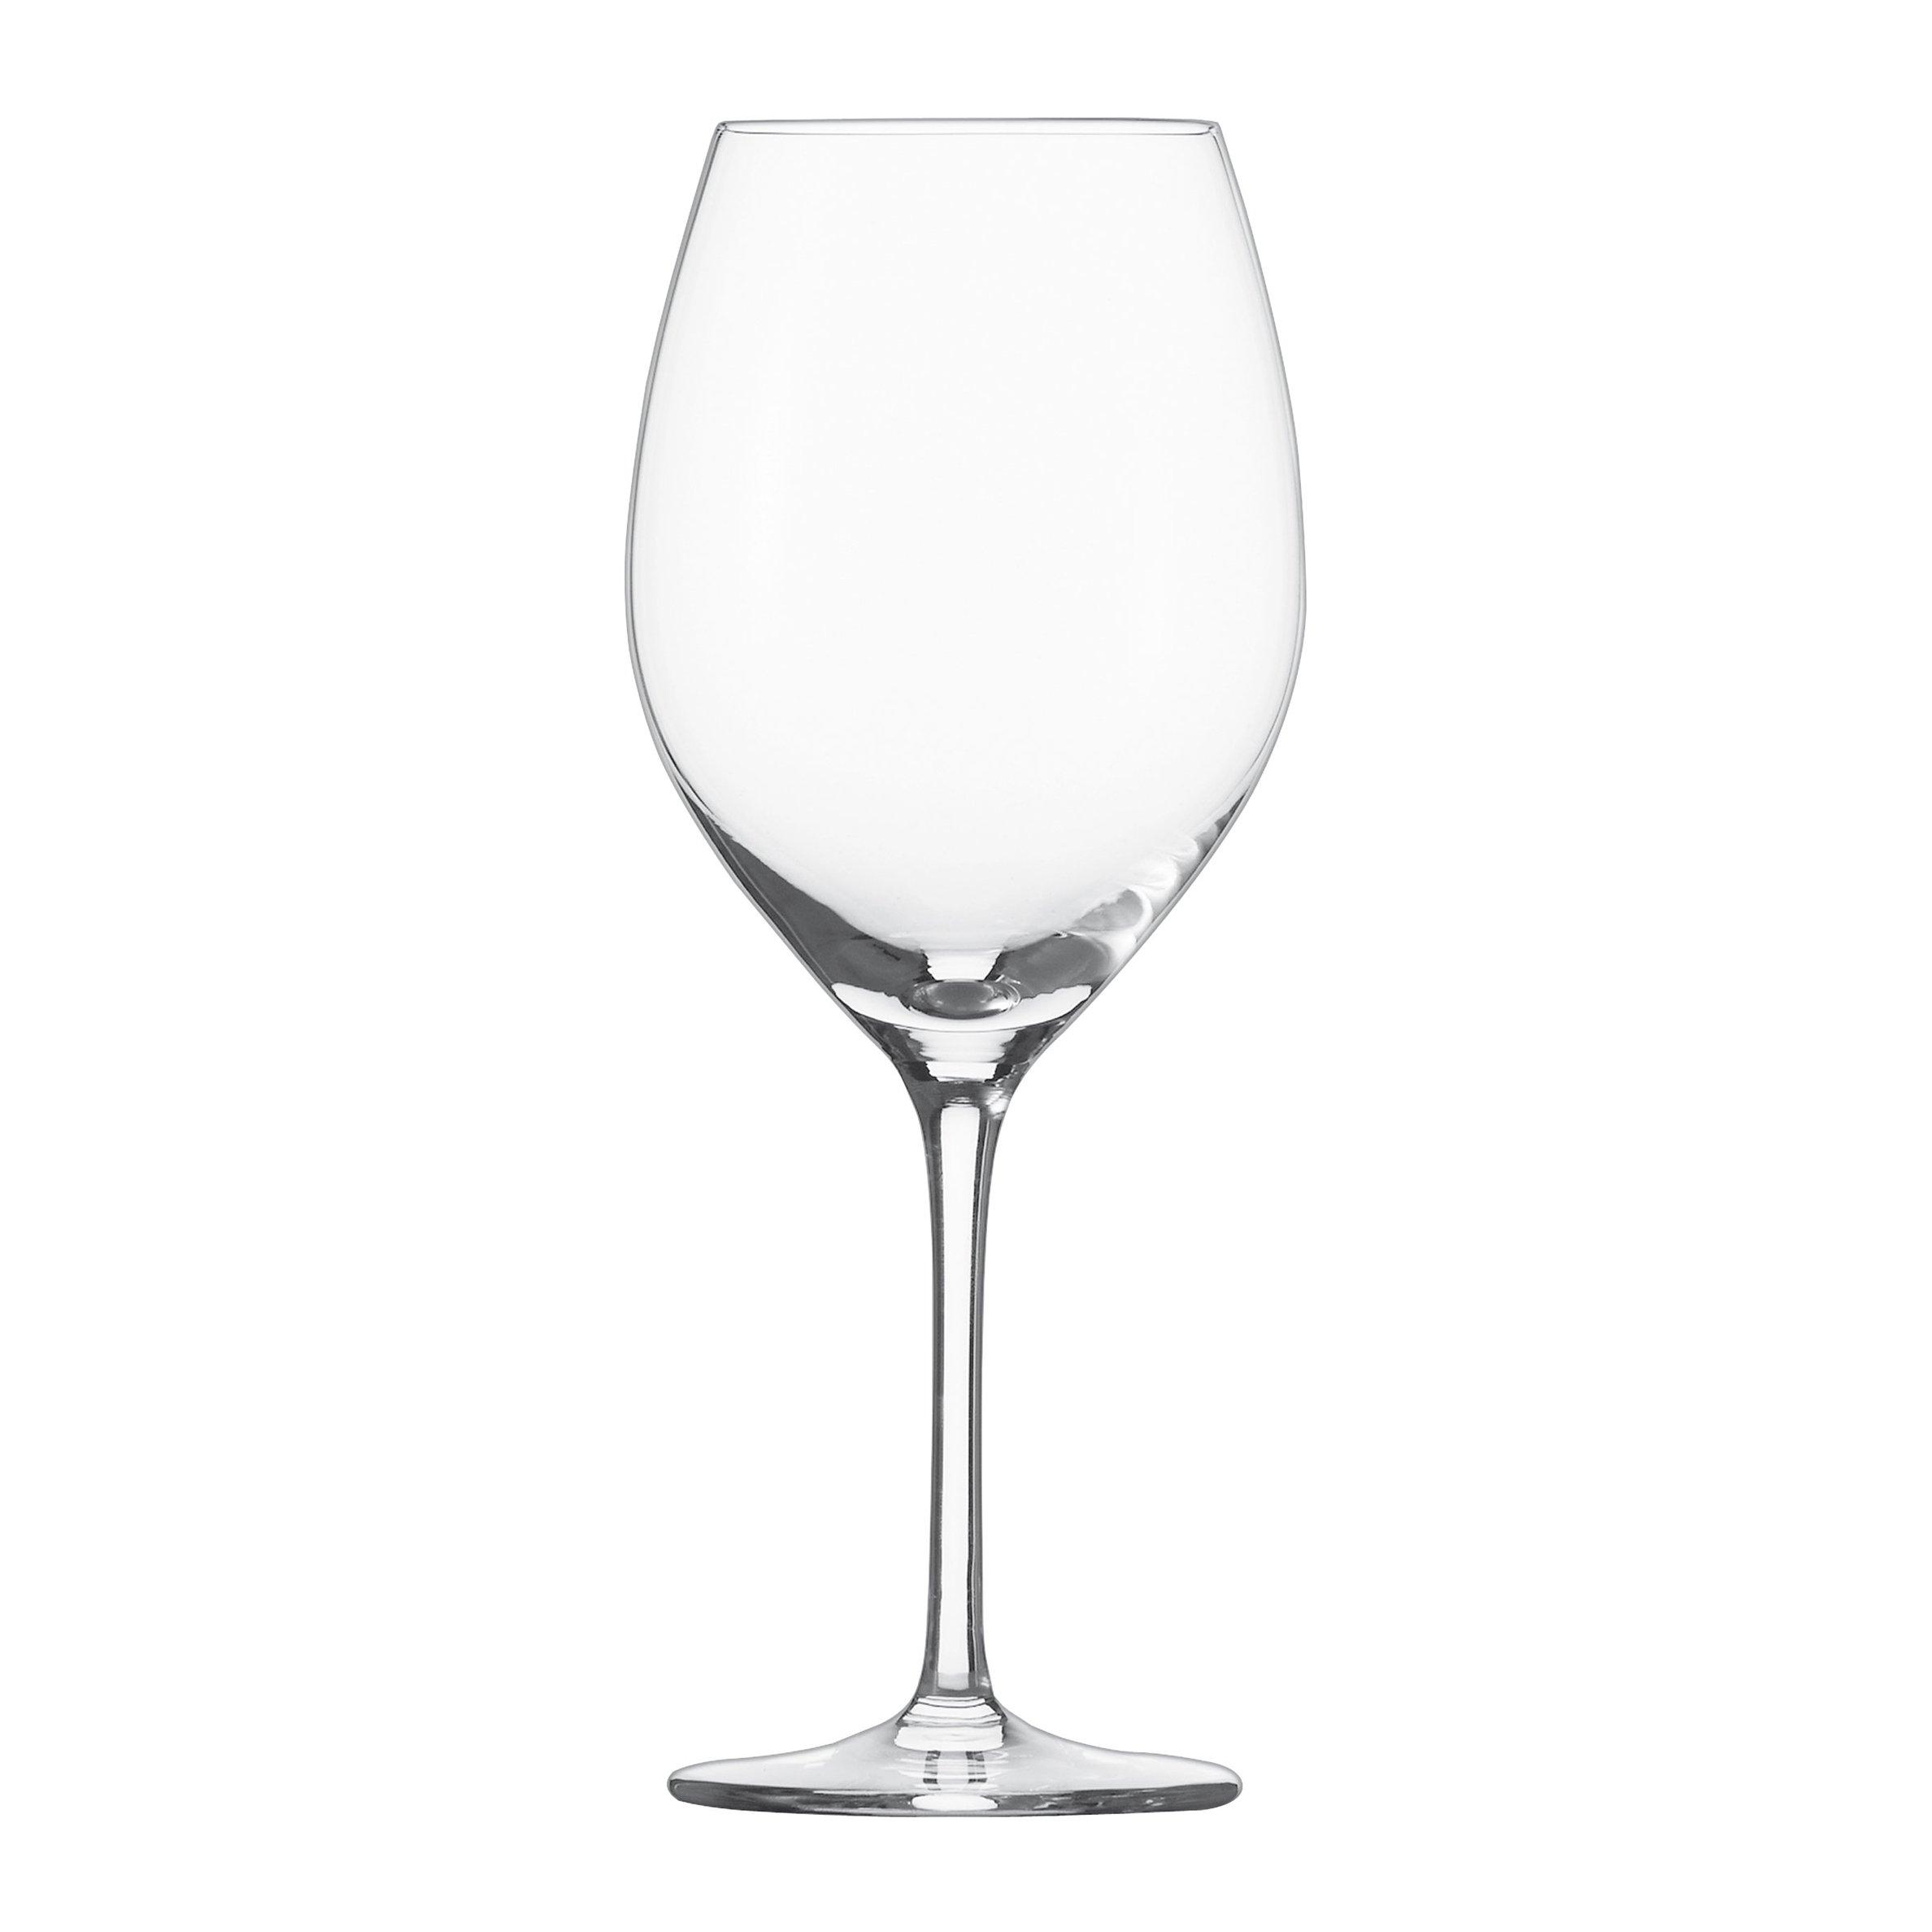 Schott Zwiesel Tritan Crystal Glass Cru Classic Stemware Collection Chardonnay White Wine Glass, 13.8-Ounce, Set of 6